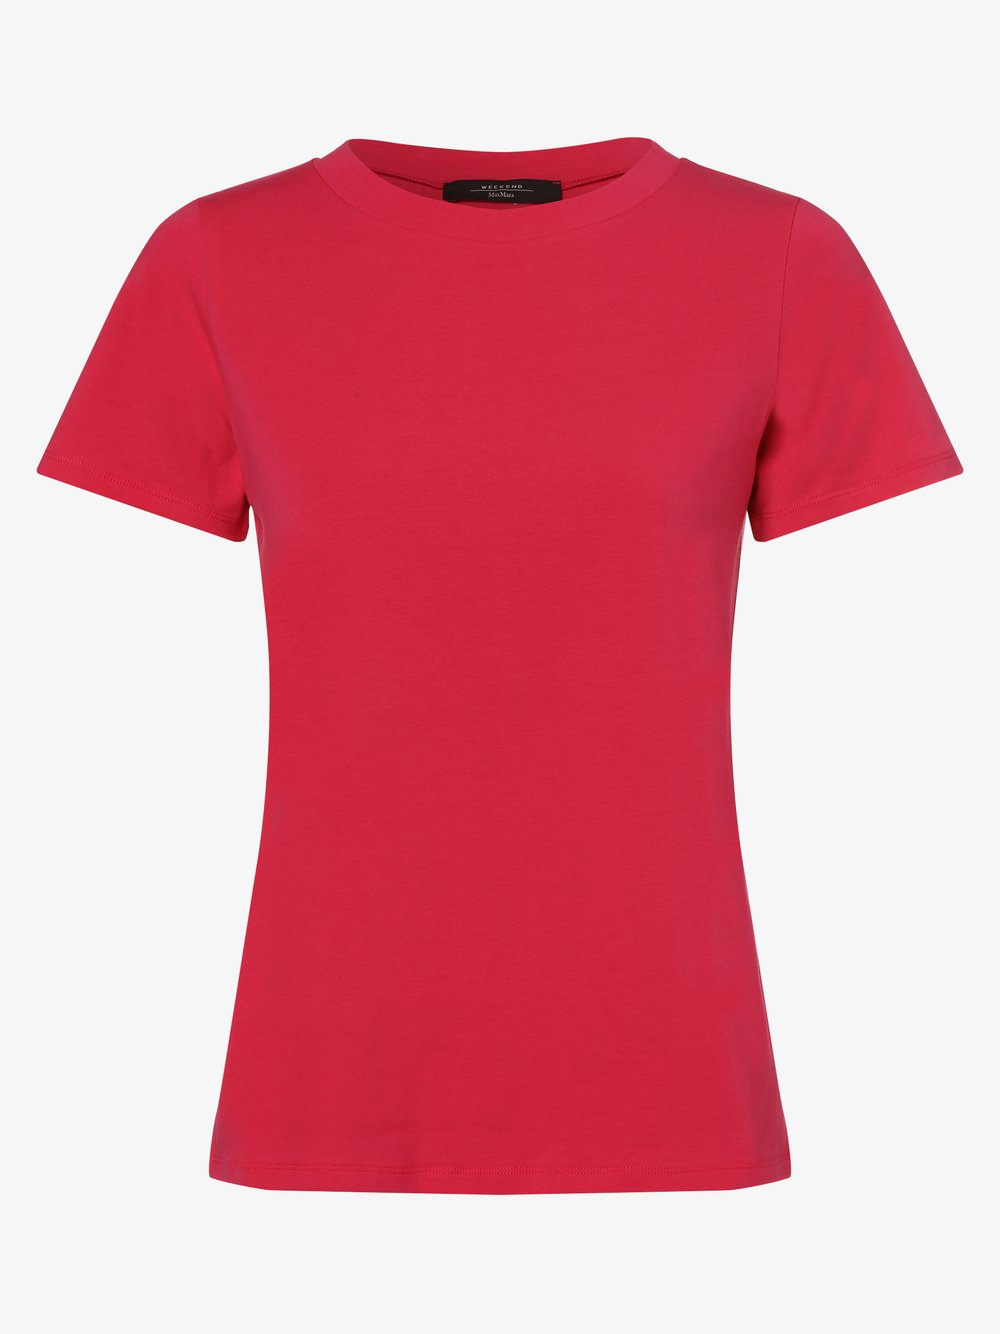 Weekend Max Mara - T-shirt damski – Multif, różowy